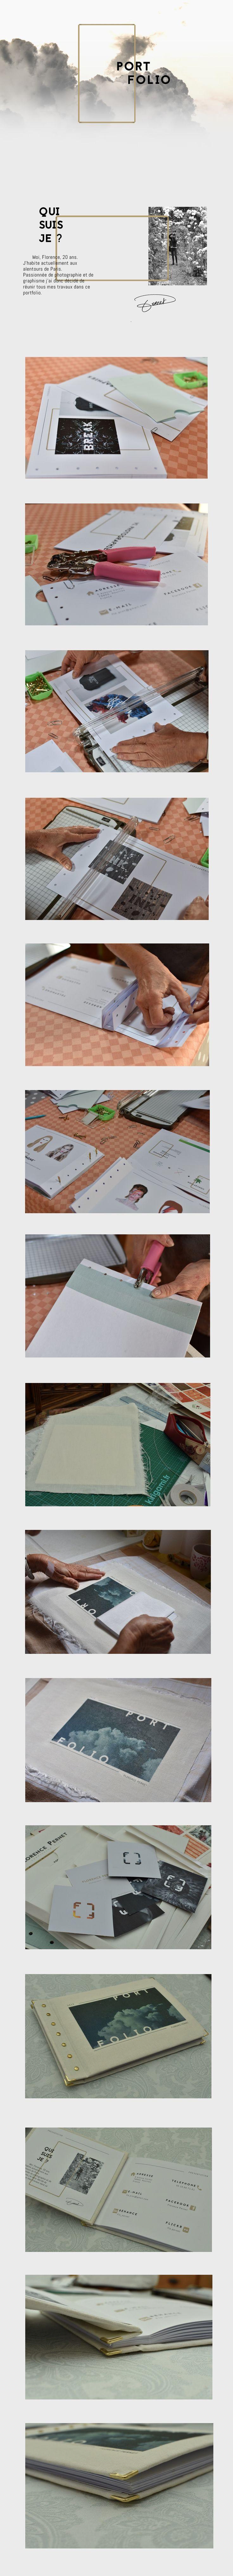 Portfolio Printed // Personal Identity // on Behance